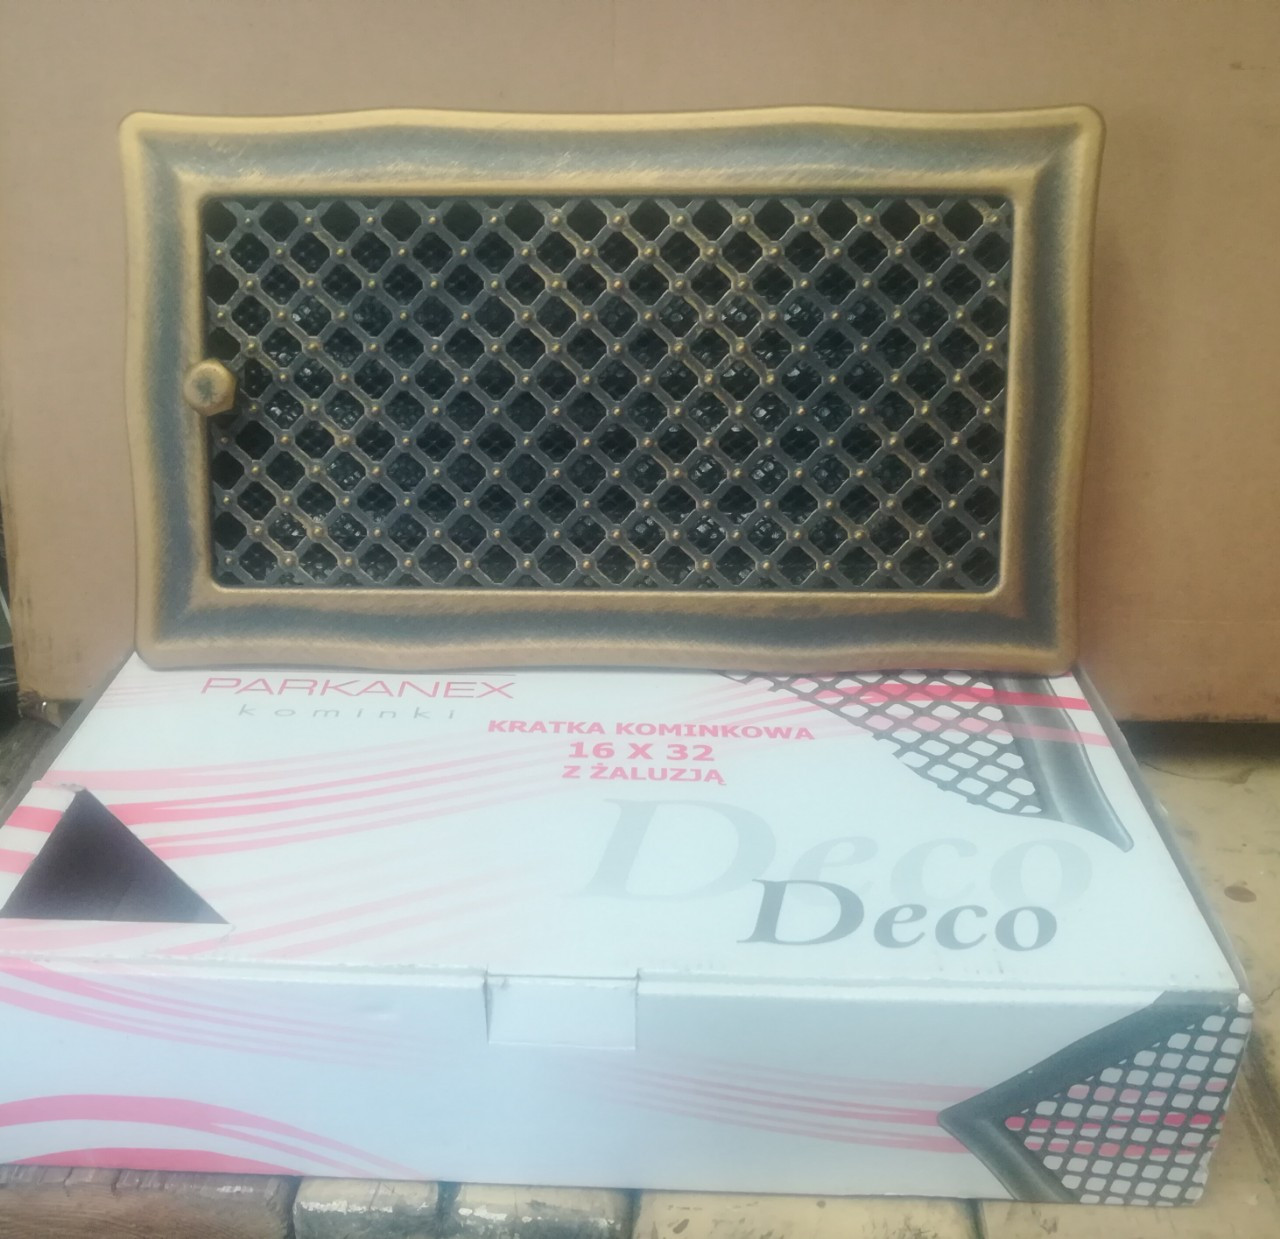 Решетка«Парканекс» Деко 16x32 с жалюзи бронза